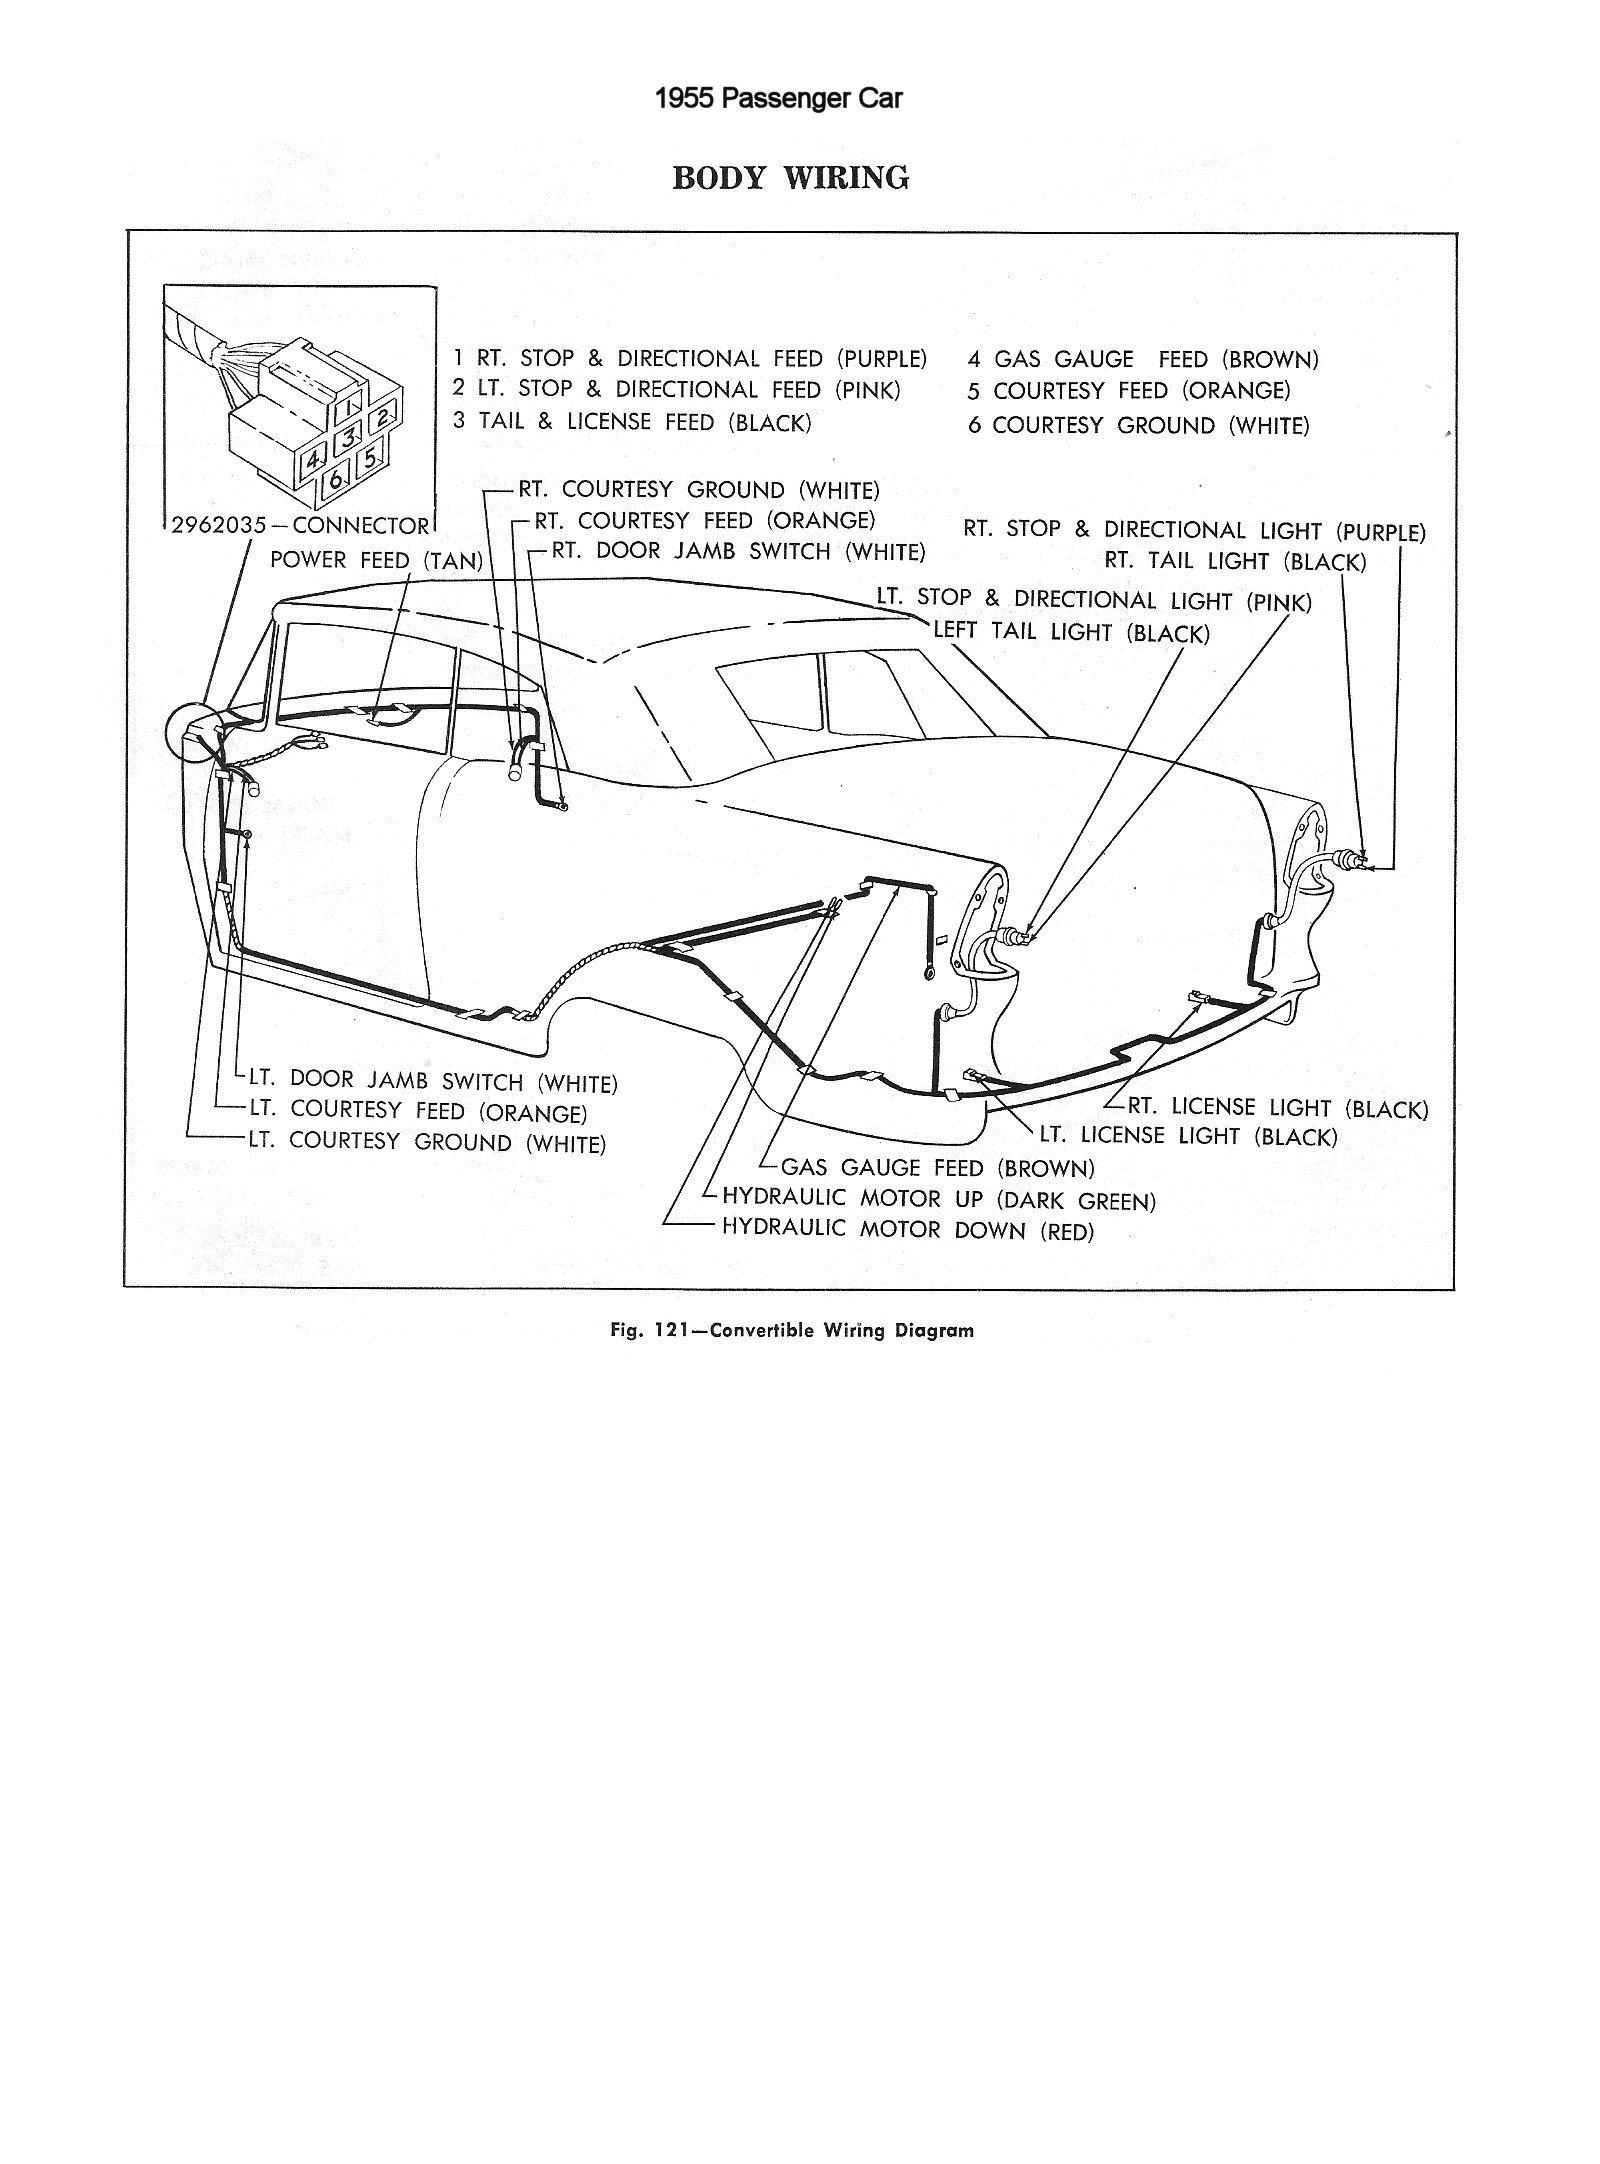 55 buick wiring diagram